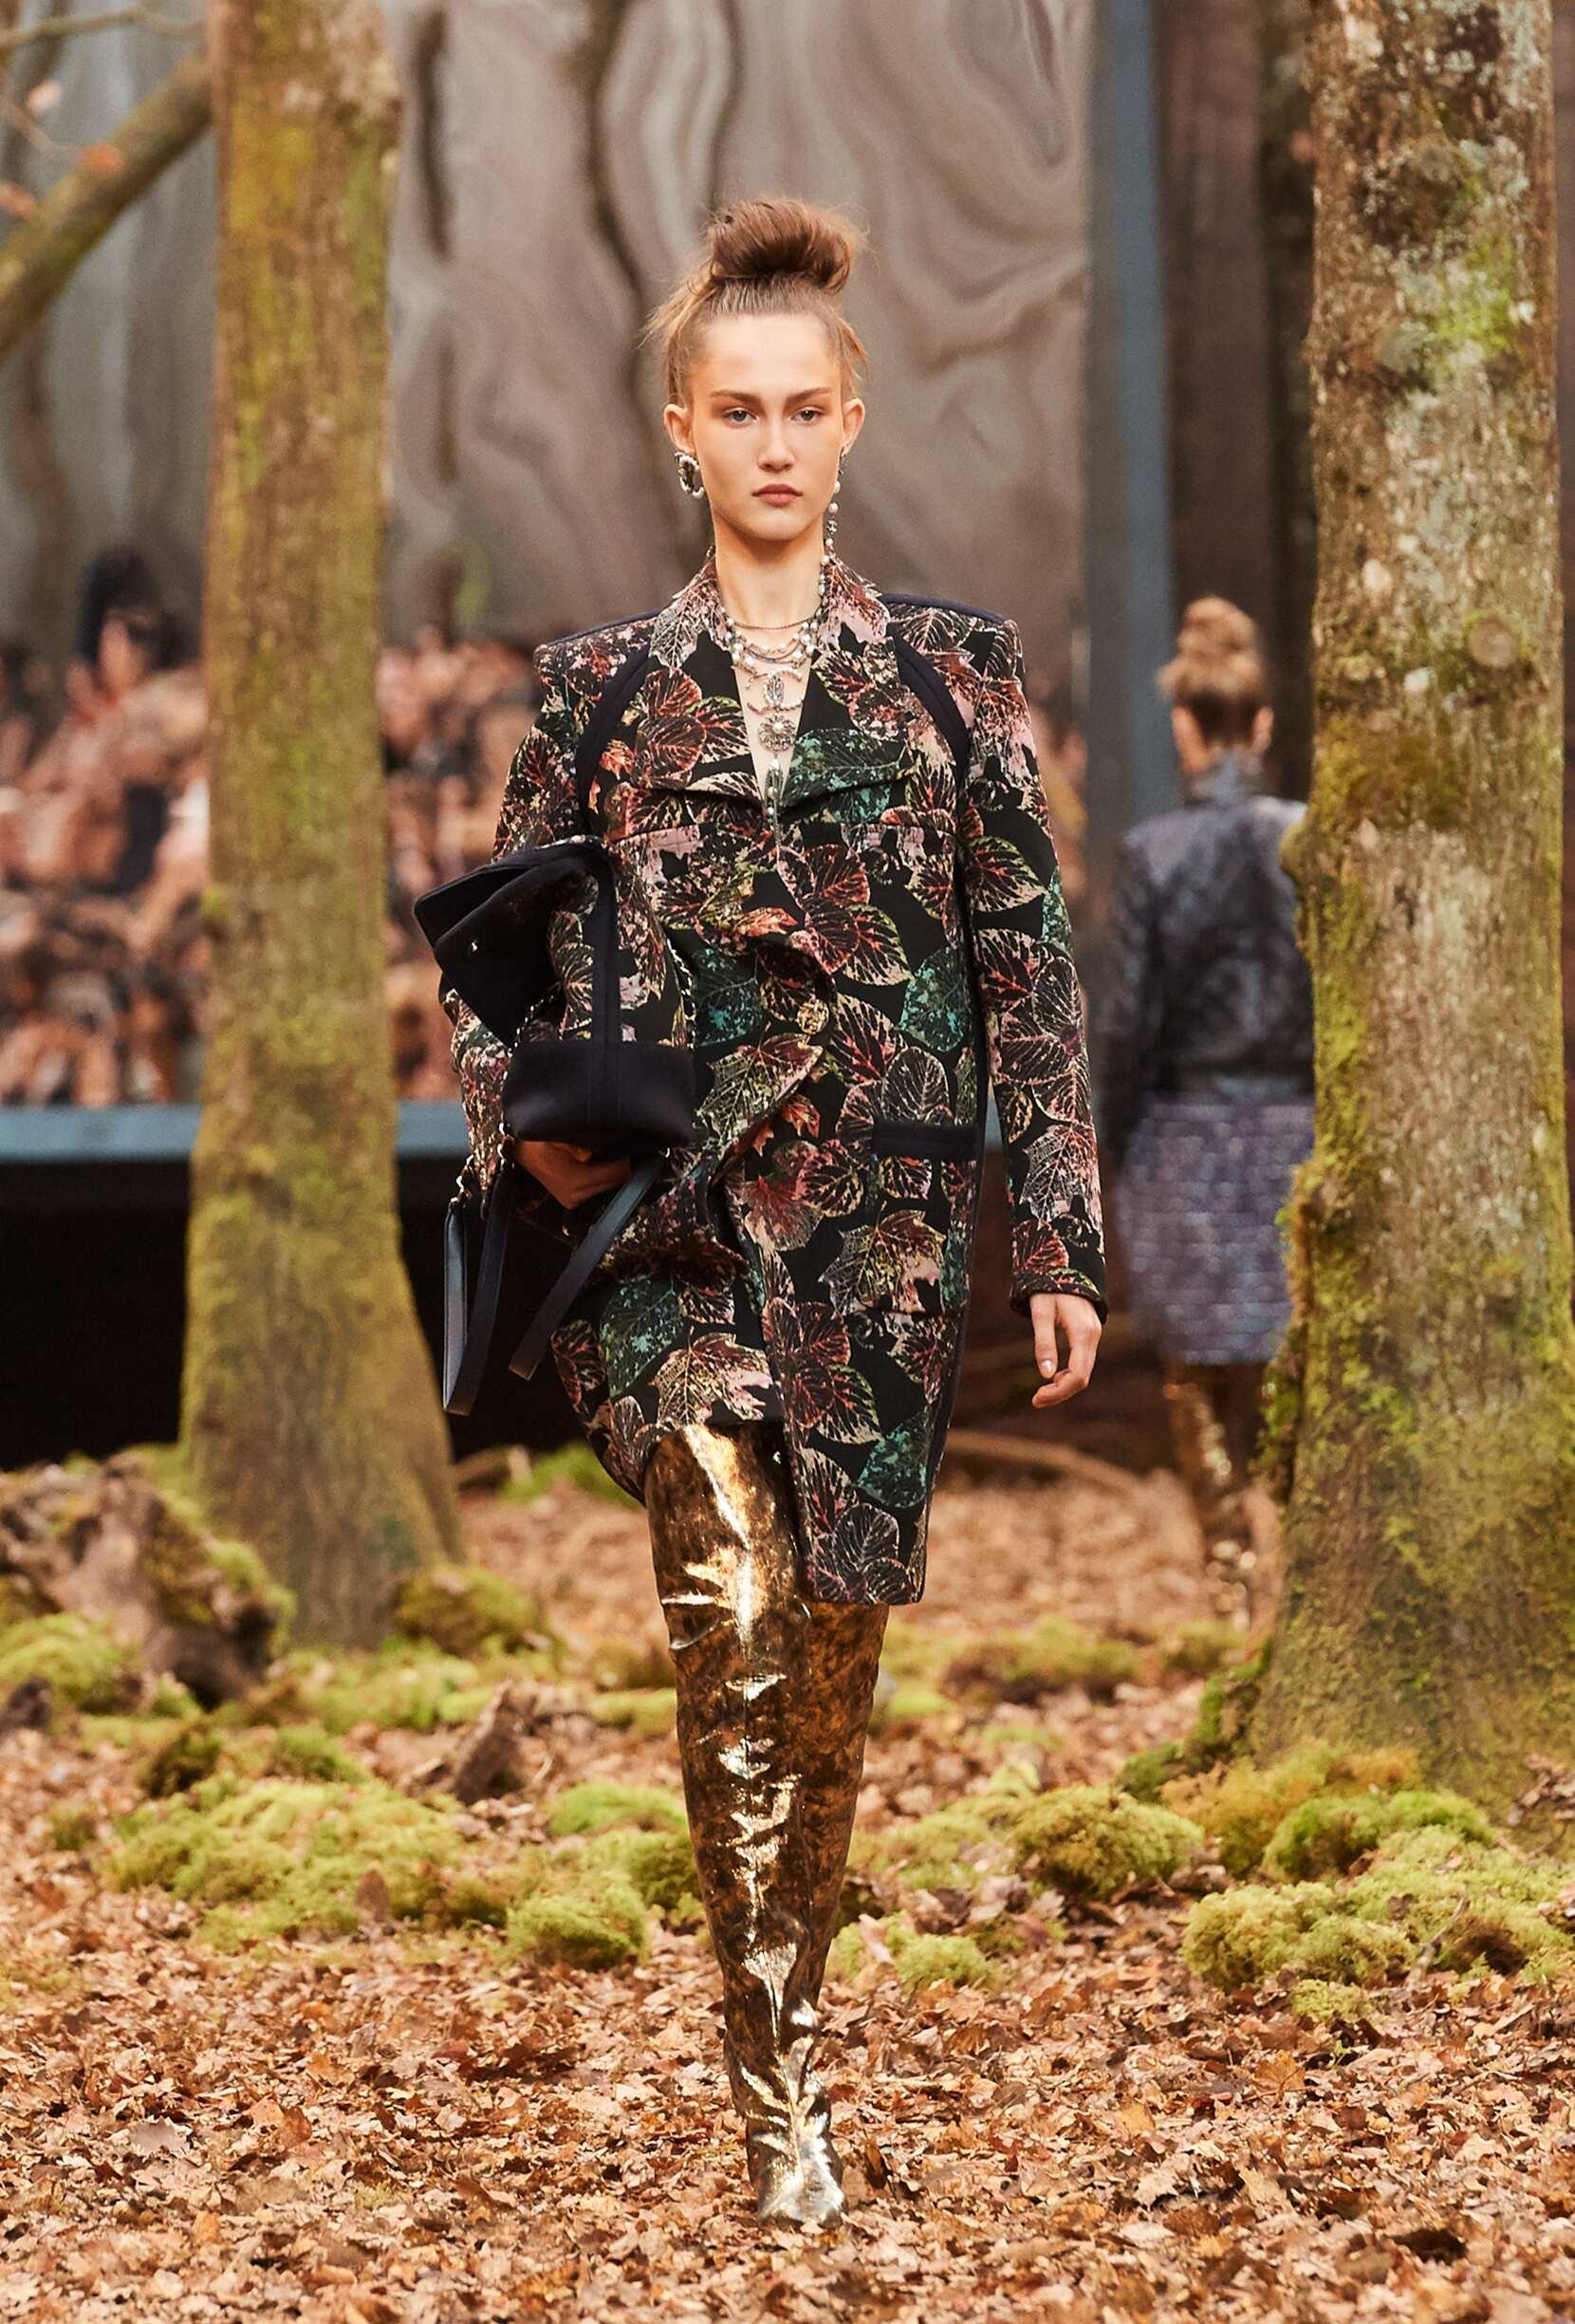 2018 Chanel Fall Catwalk